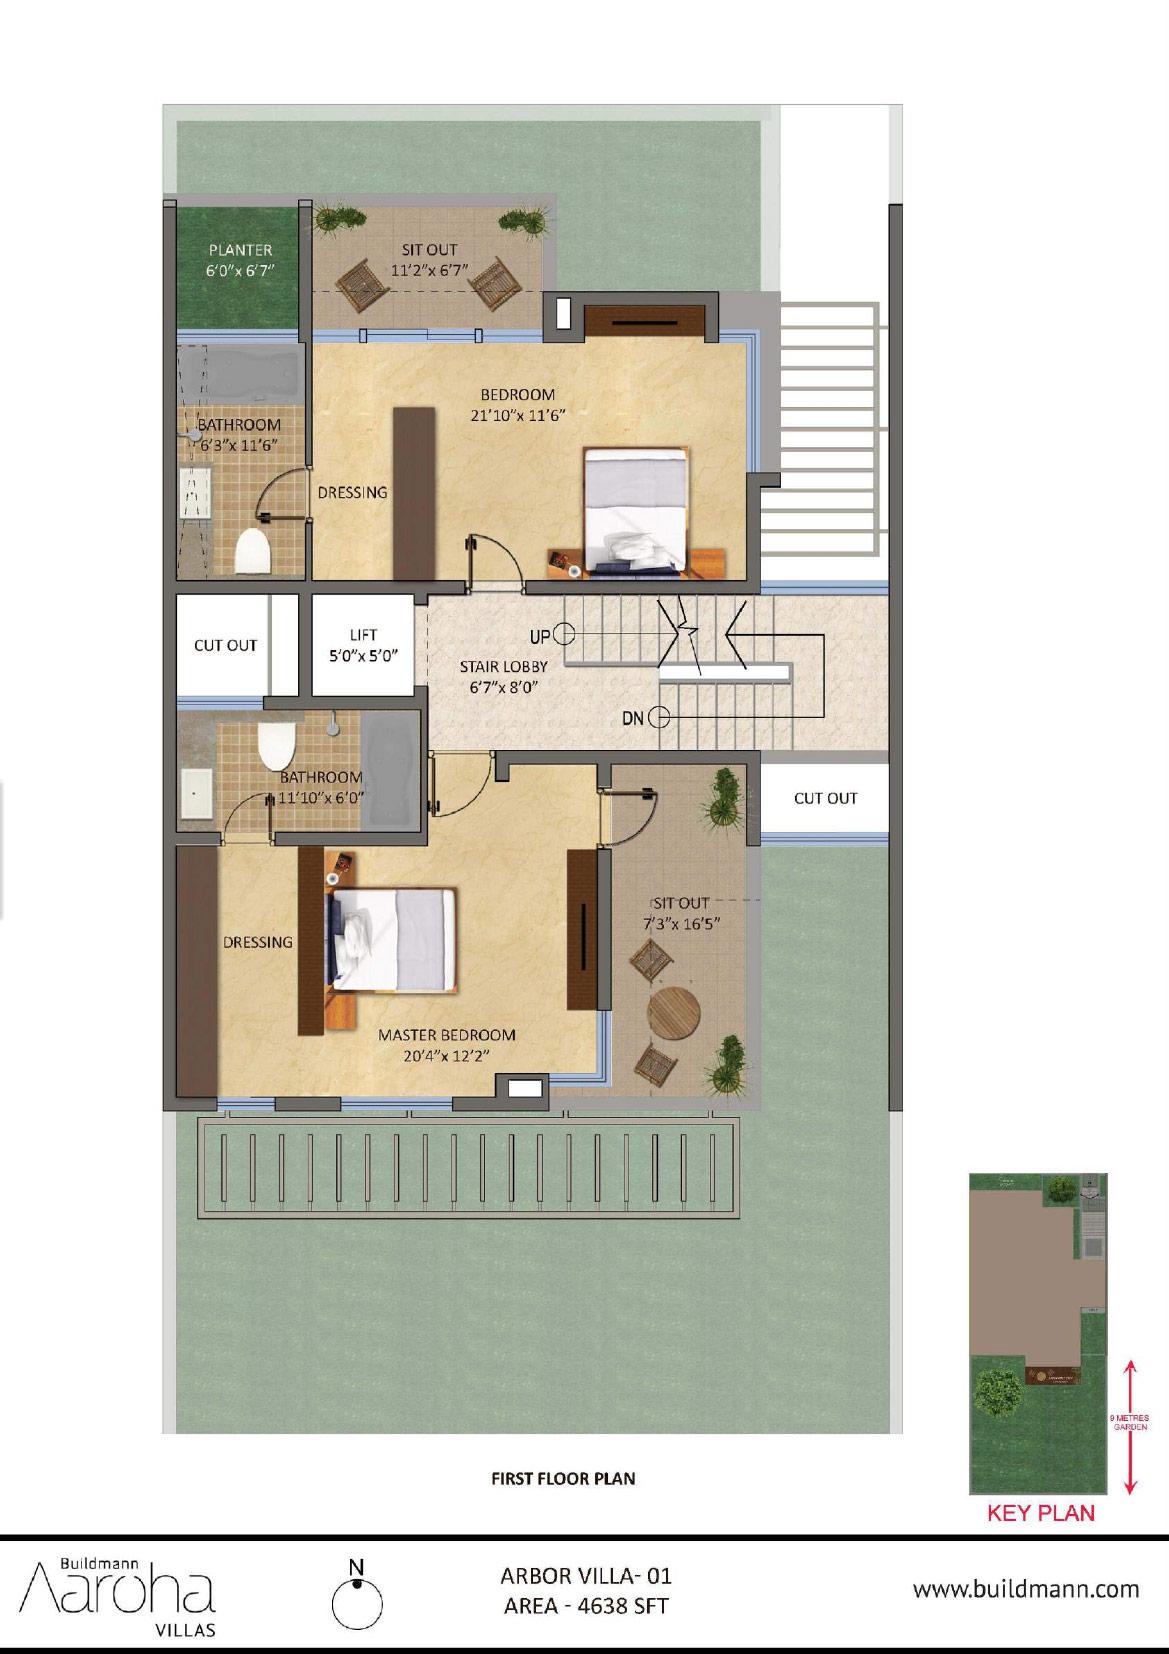 Buildmann Aaroha Arbor villas